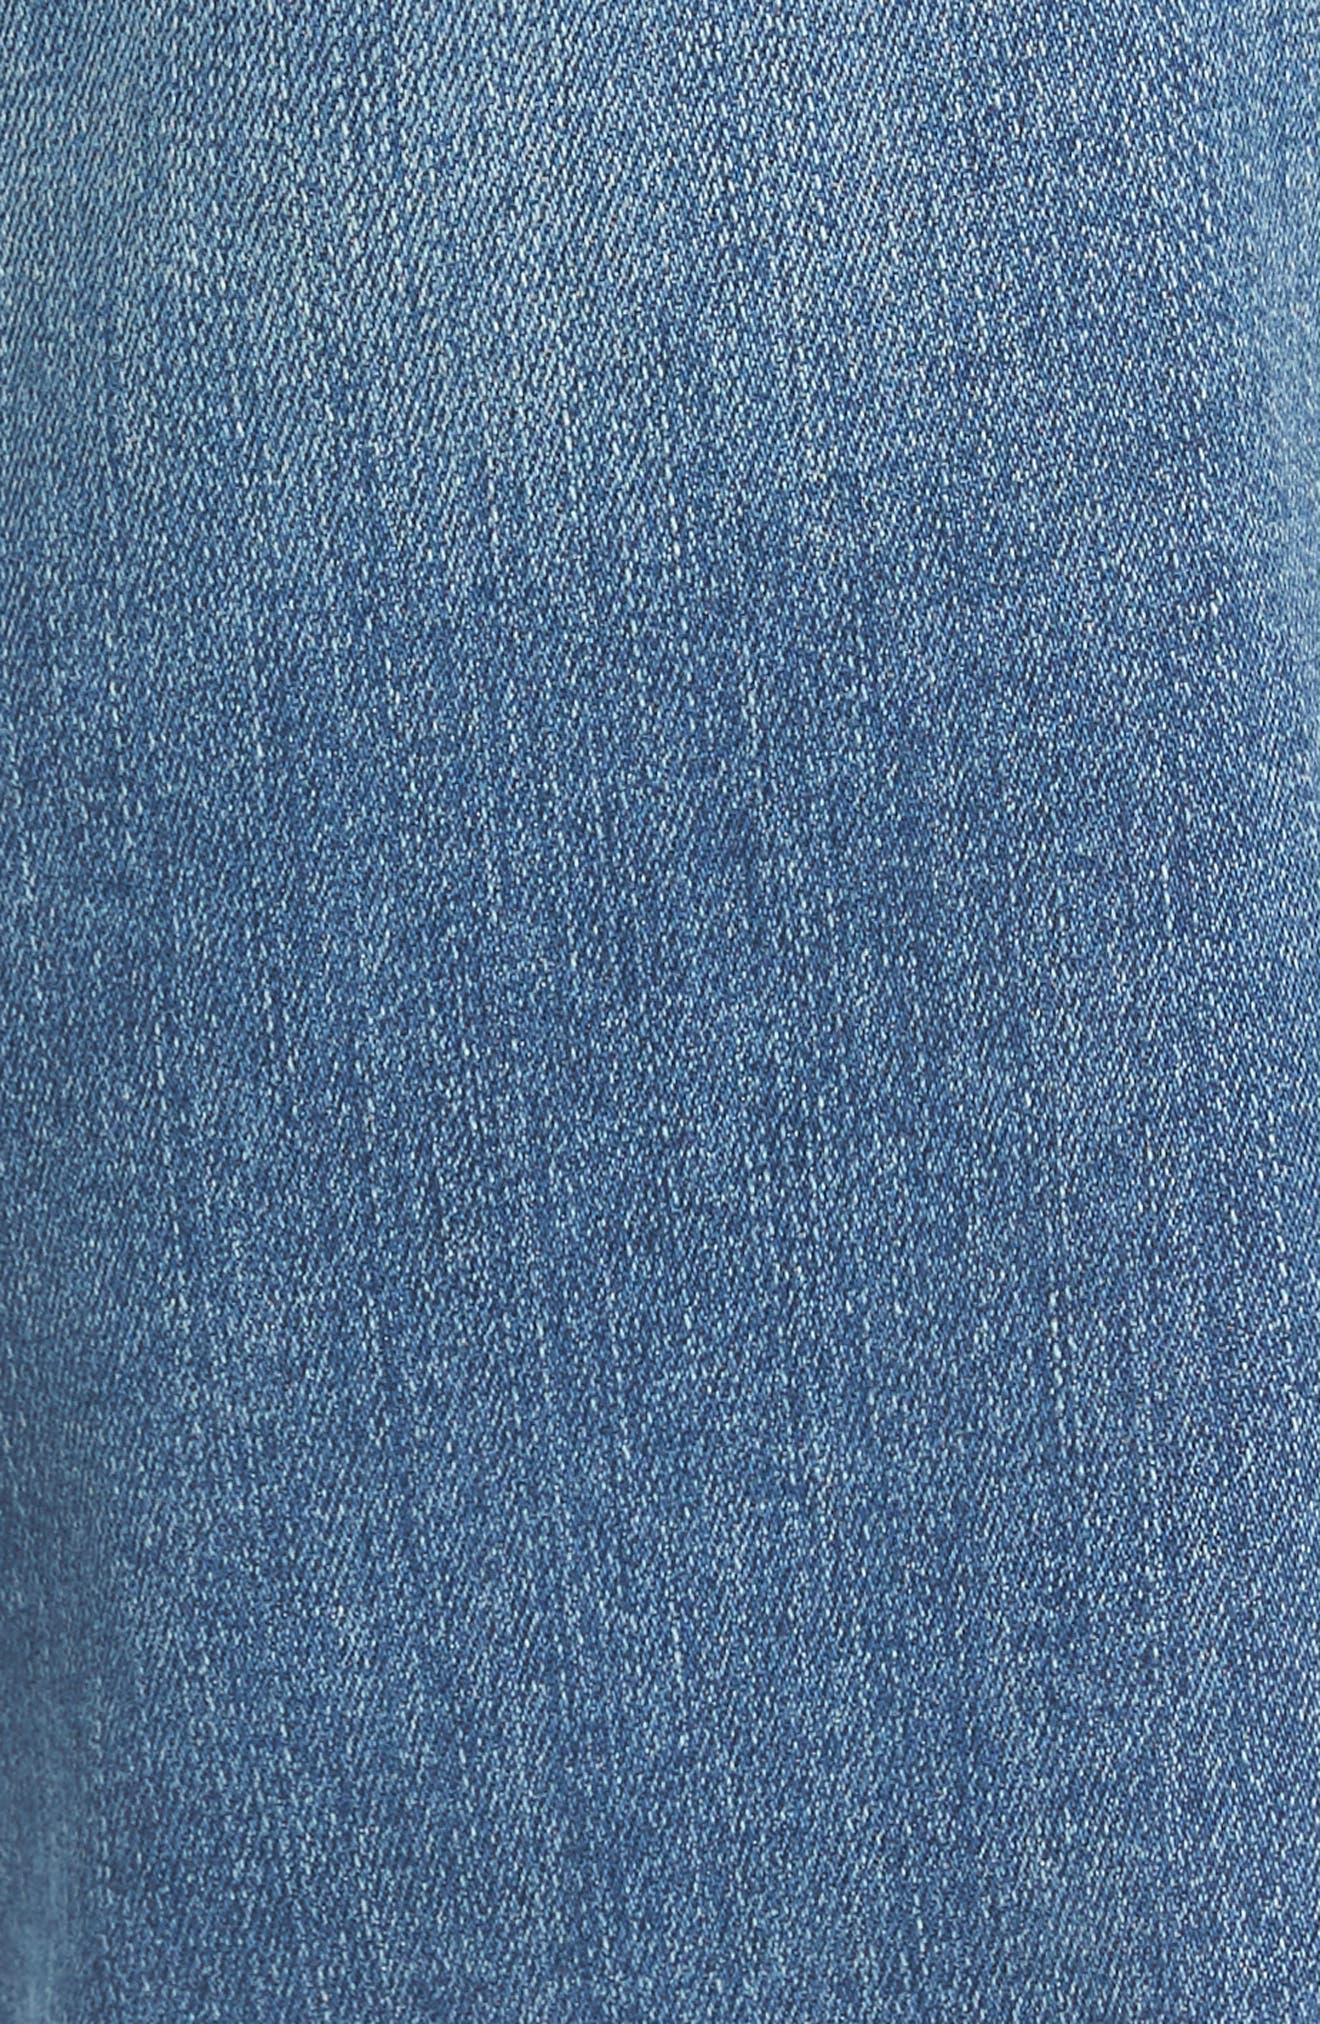 PAIGE,                             Federal Slim Straight Leg Jeans,                             Alternate thumbnail 5, color,                             400